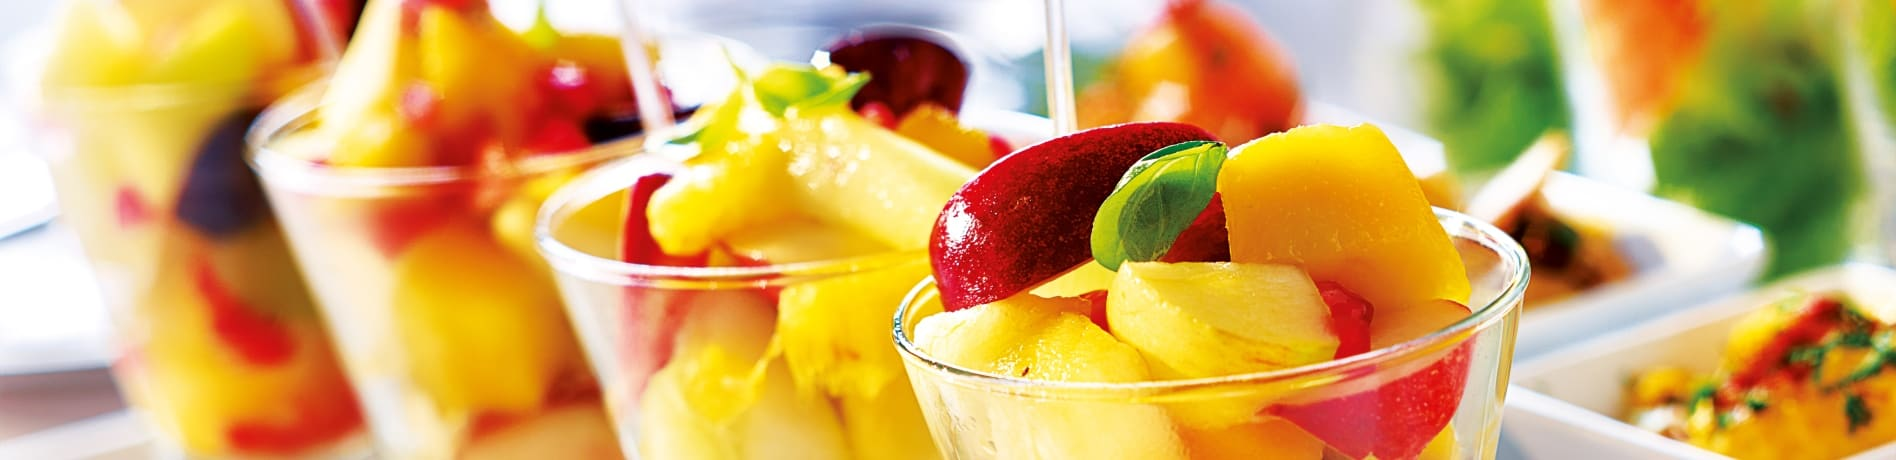 Fructe moldova salata in pahare din sticla